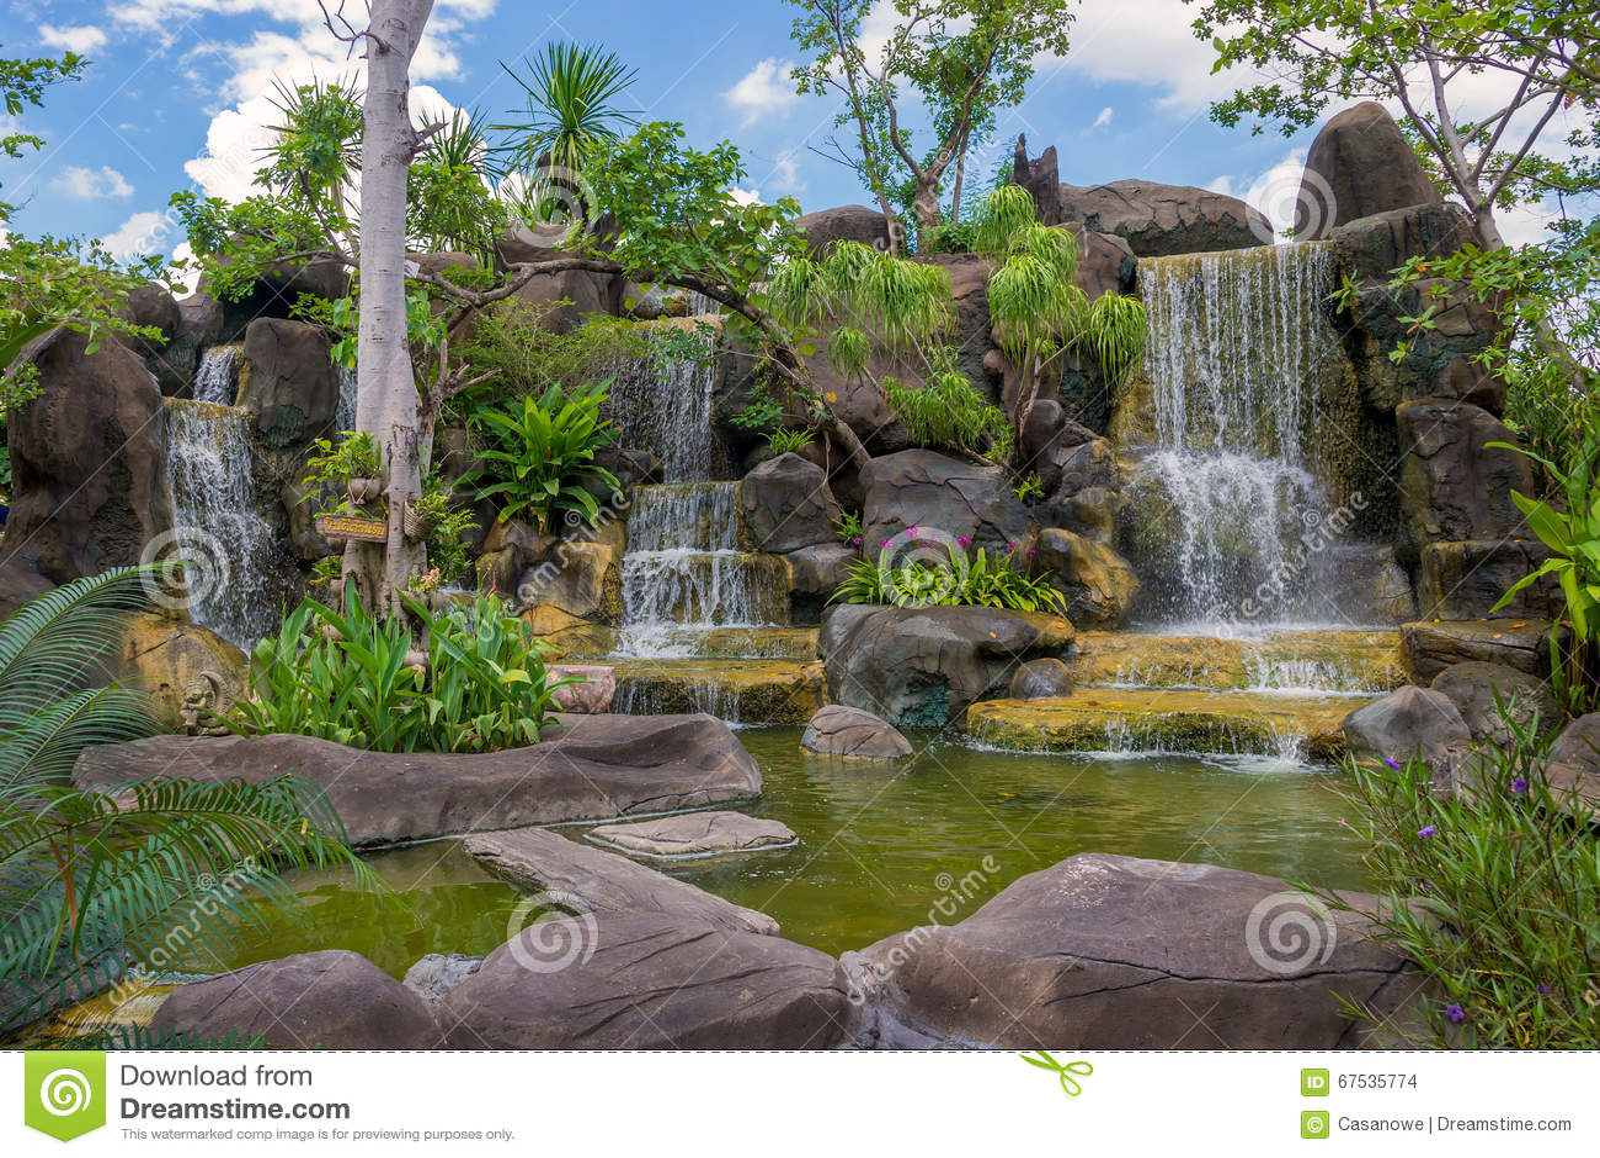 Waterval In Tuin : Waterval tuin new waterval in tuin top aluminium folie waterval